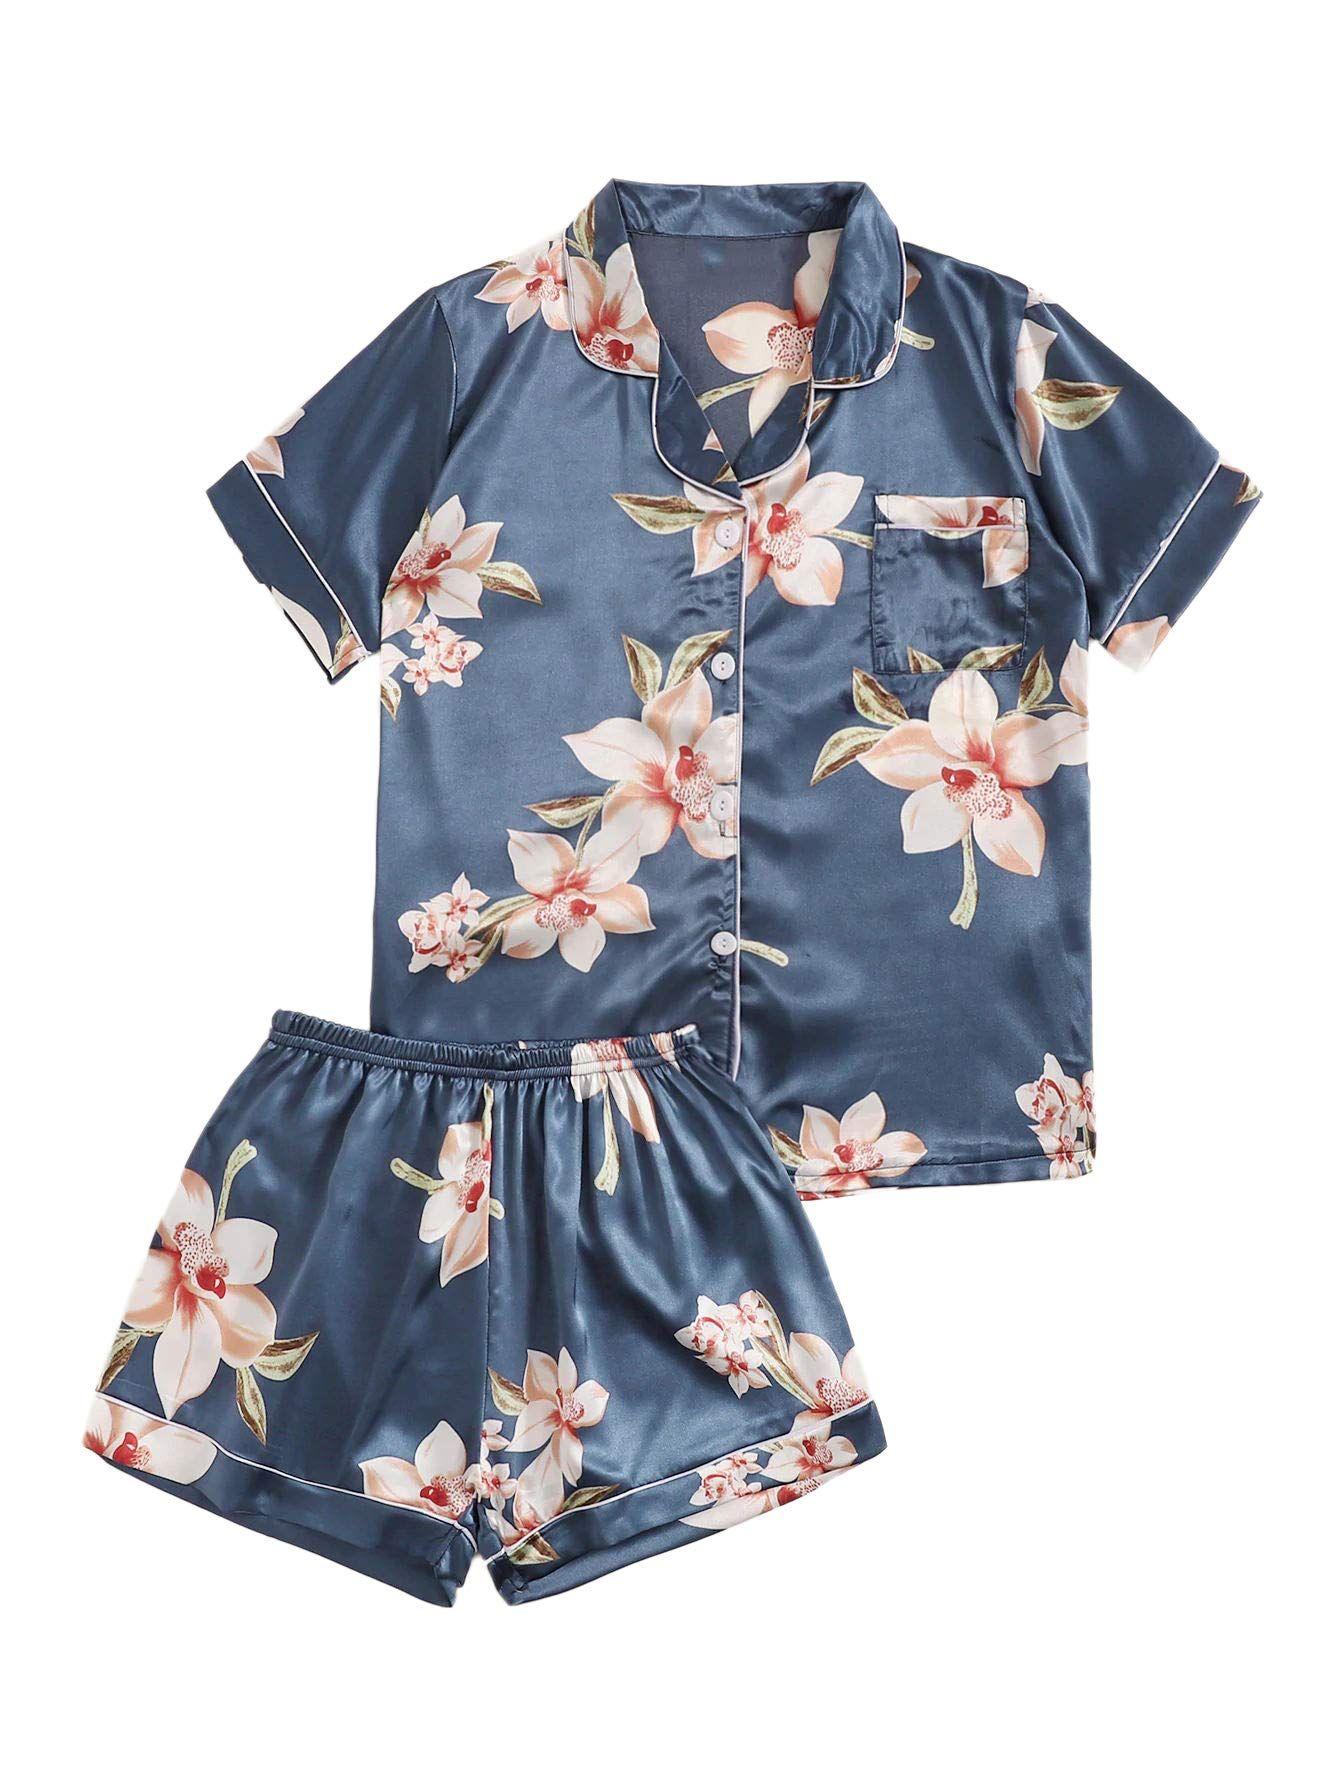 Floerns Womens Notch Collar Shorts Loose Sleepwear Two Piece Pajama Set